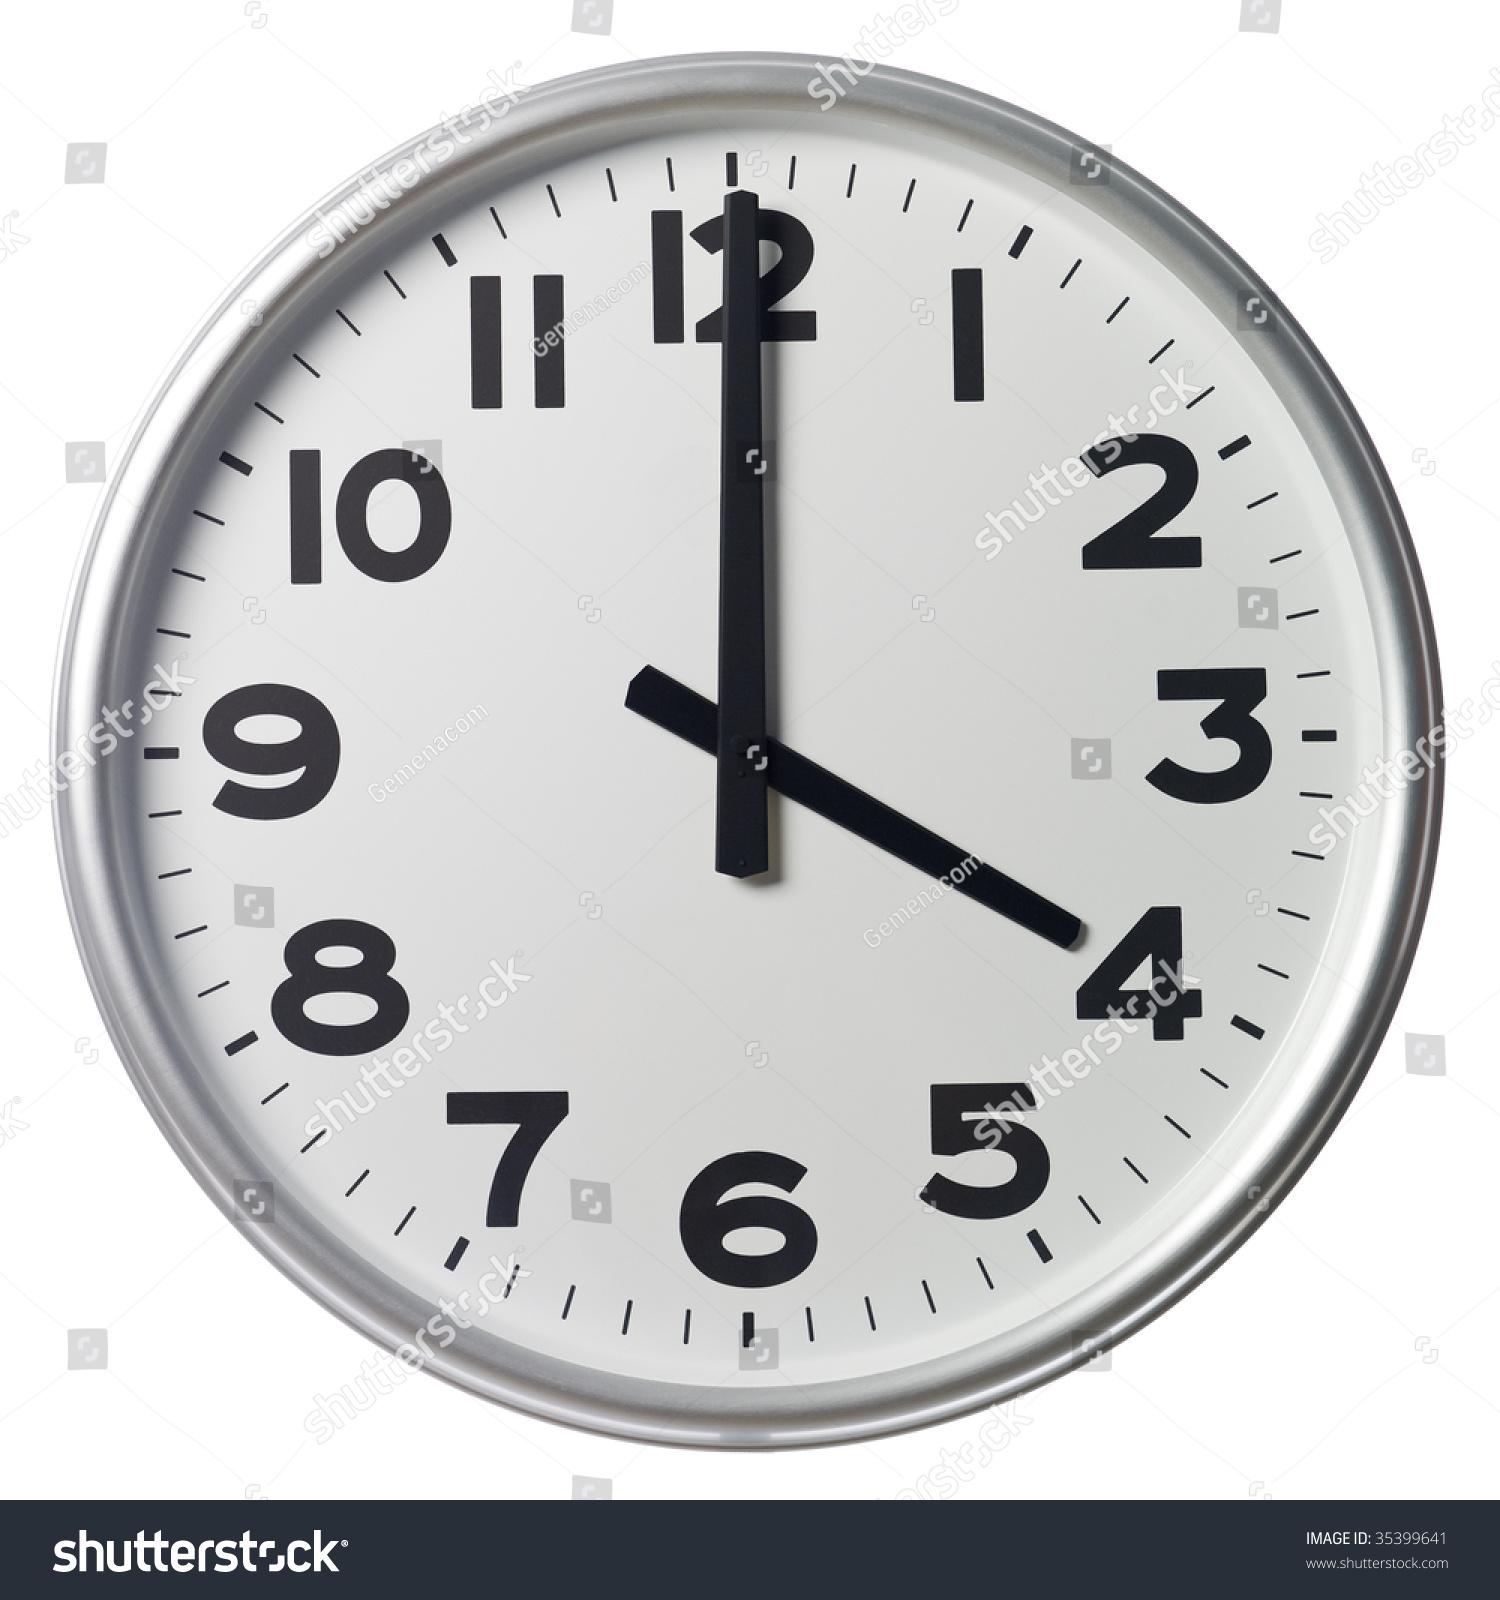 Four O'Clock Stock Photo 35399641 : Shutterstock